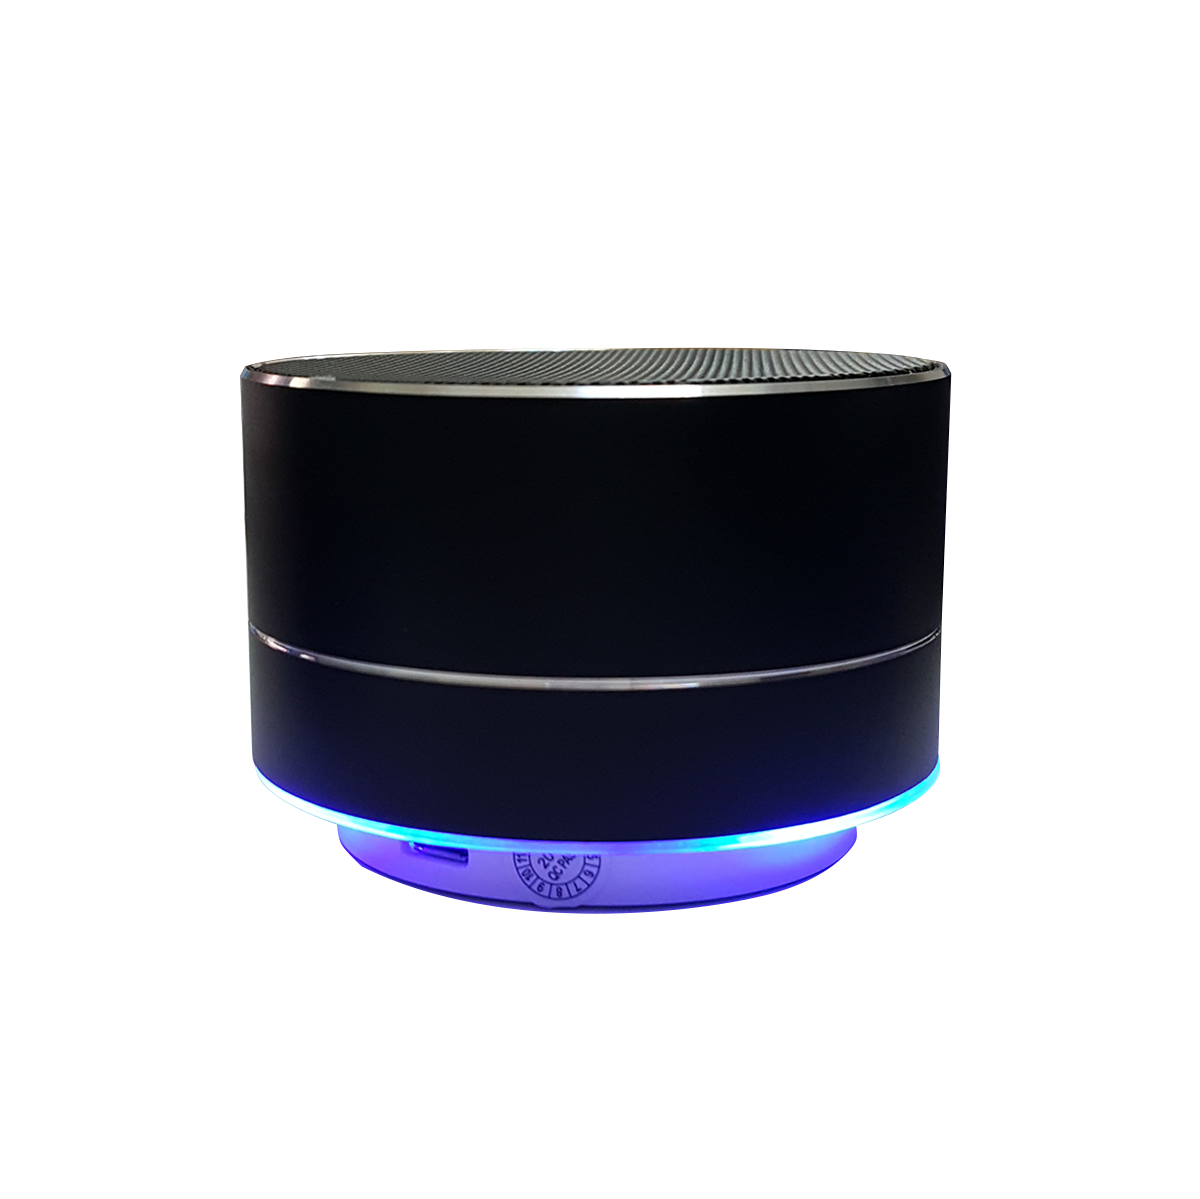 Loa Bluetooth Tuxedo A2, 3W, bluetooth 4.1, nhỏ gọn, thời trang